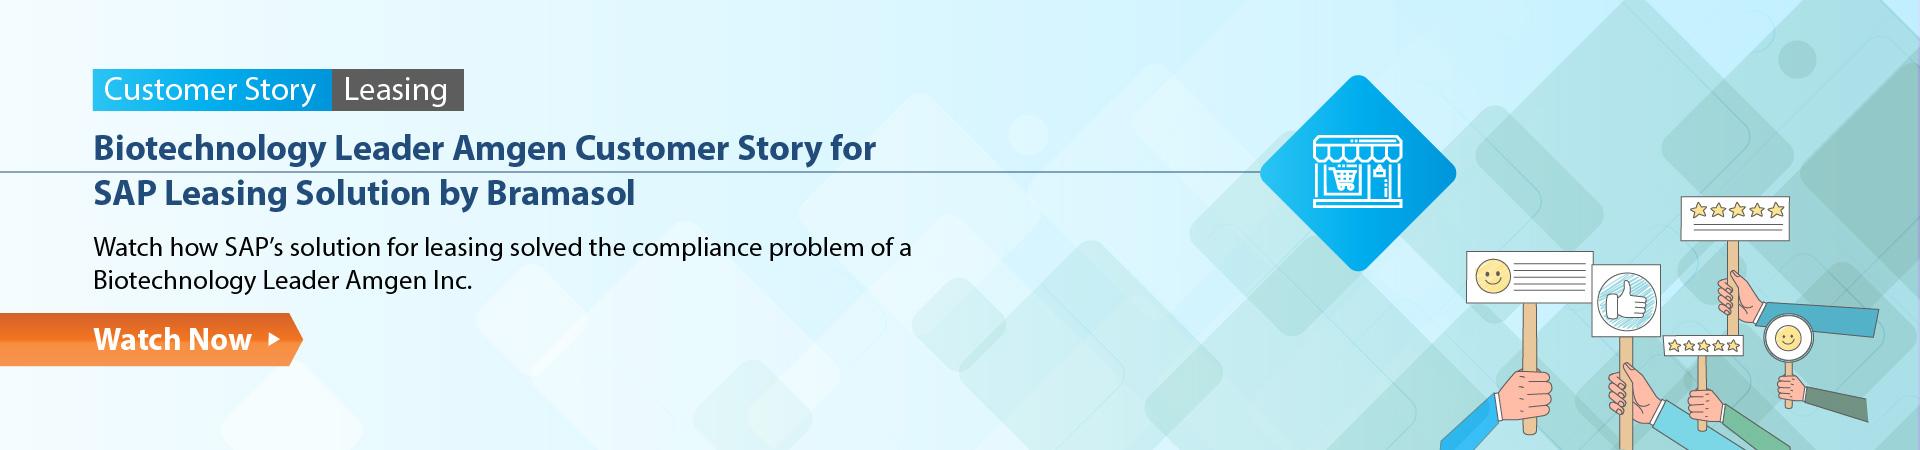 Customer Story Amen Banner